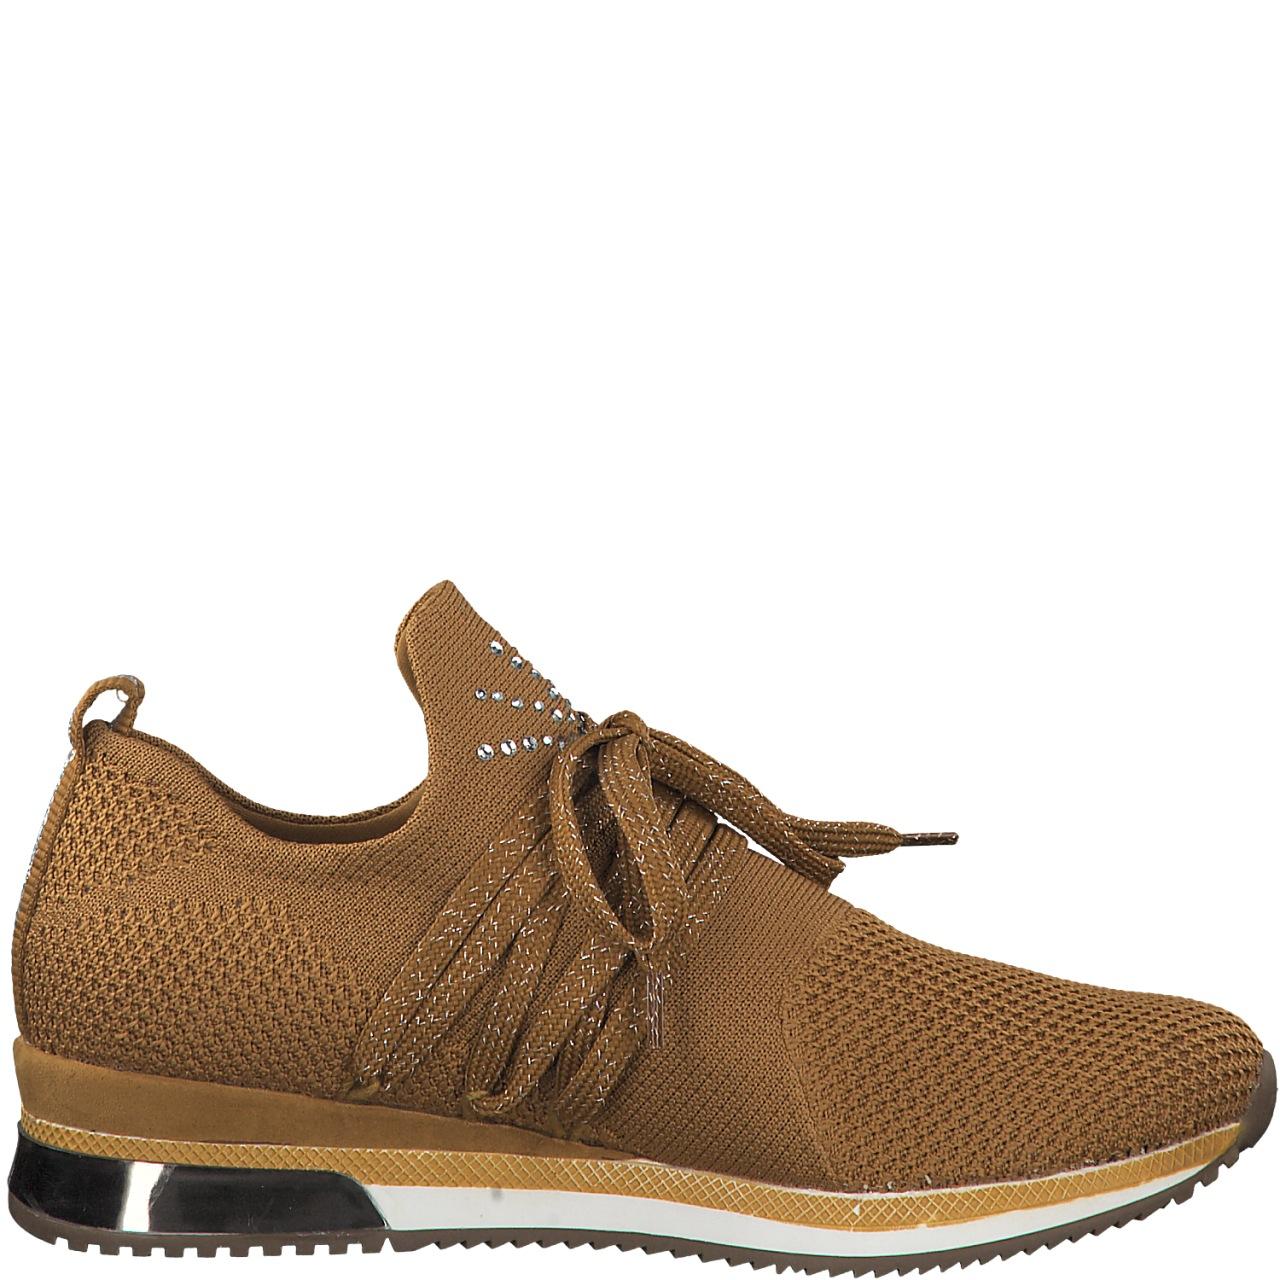 MARCO TOZZI Premio Fashion Slip On Sneaker Low Top 2 23738